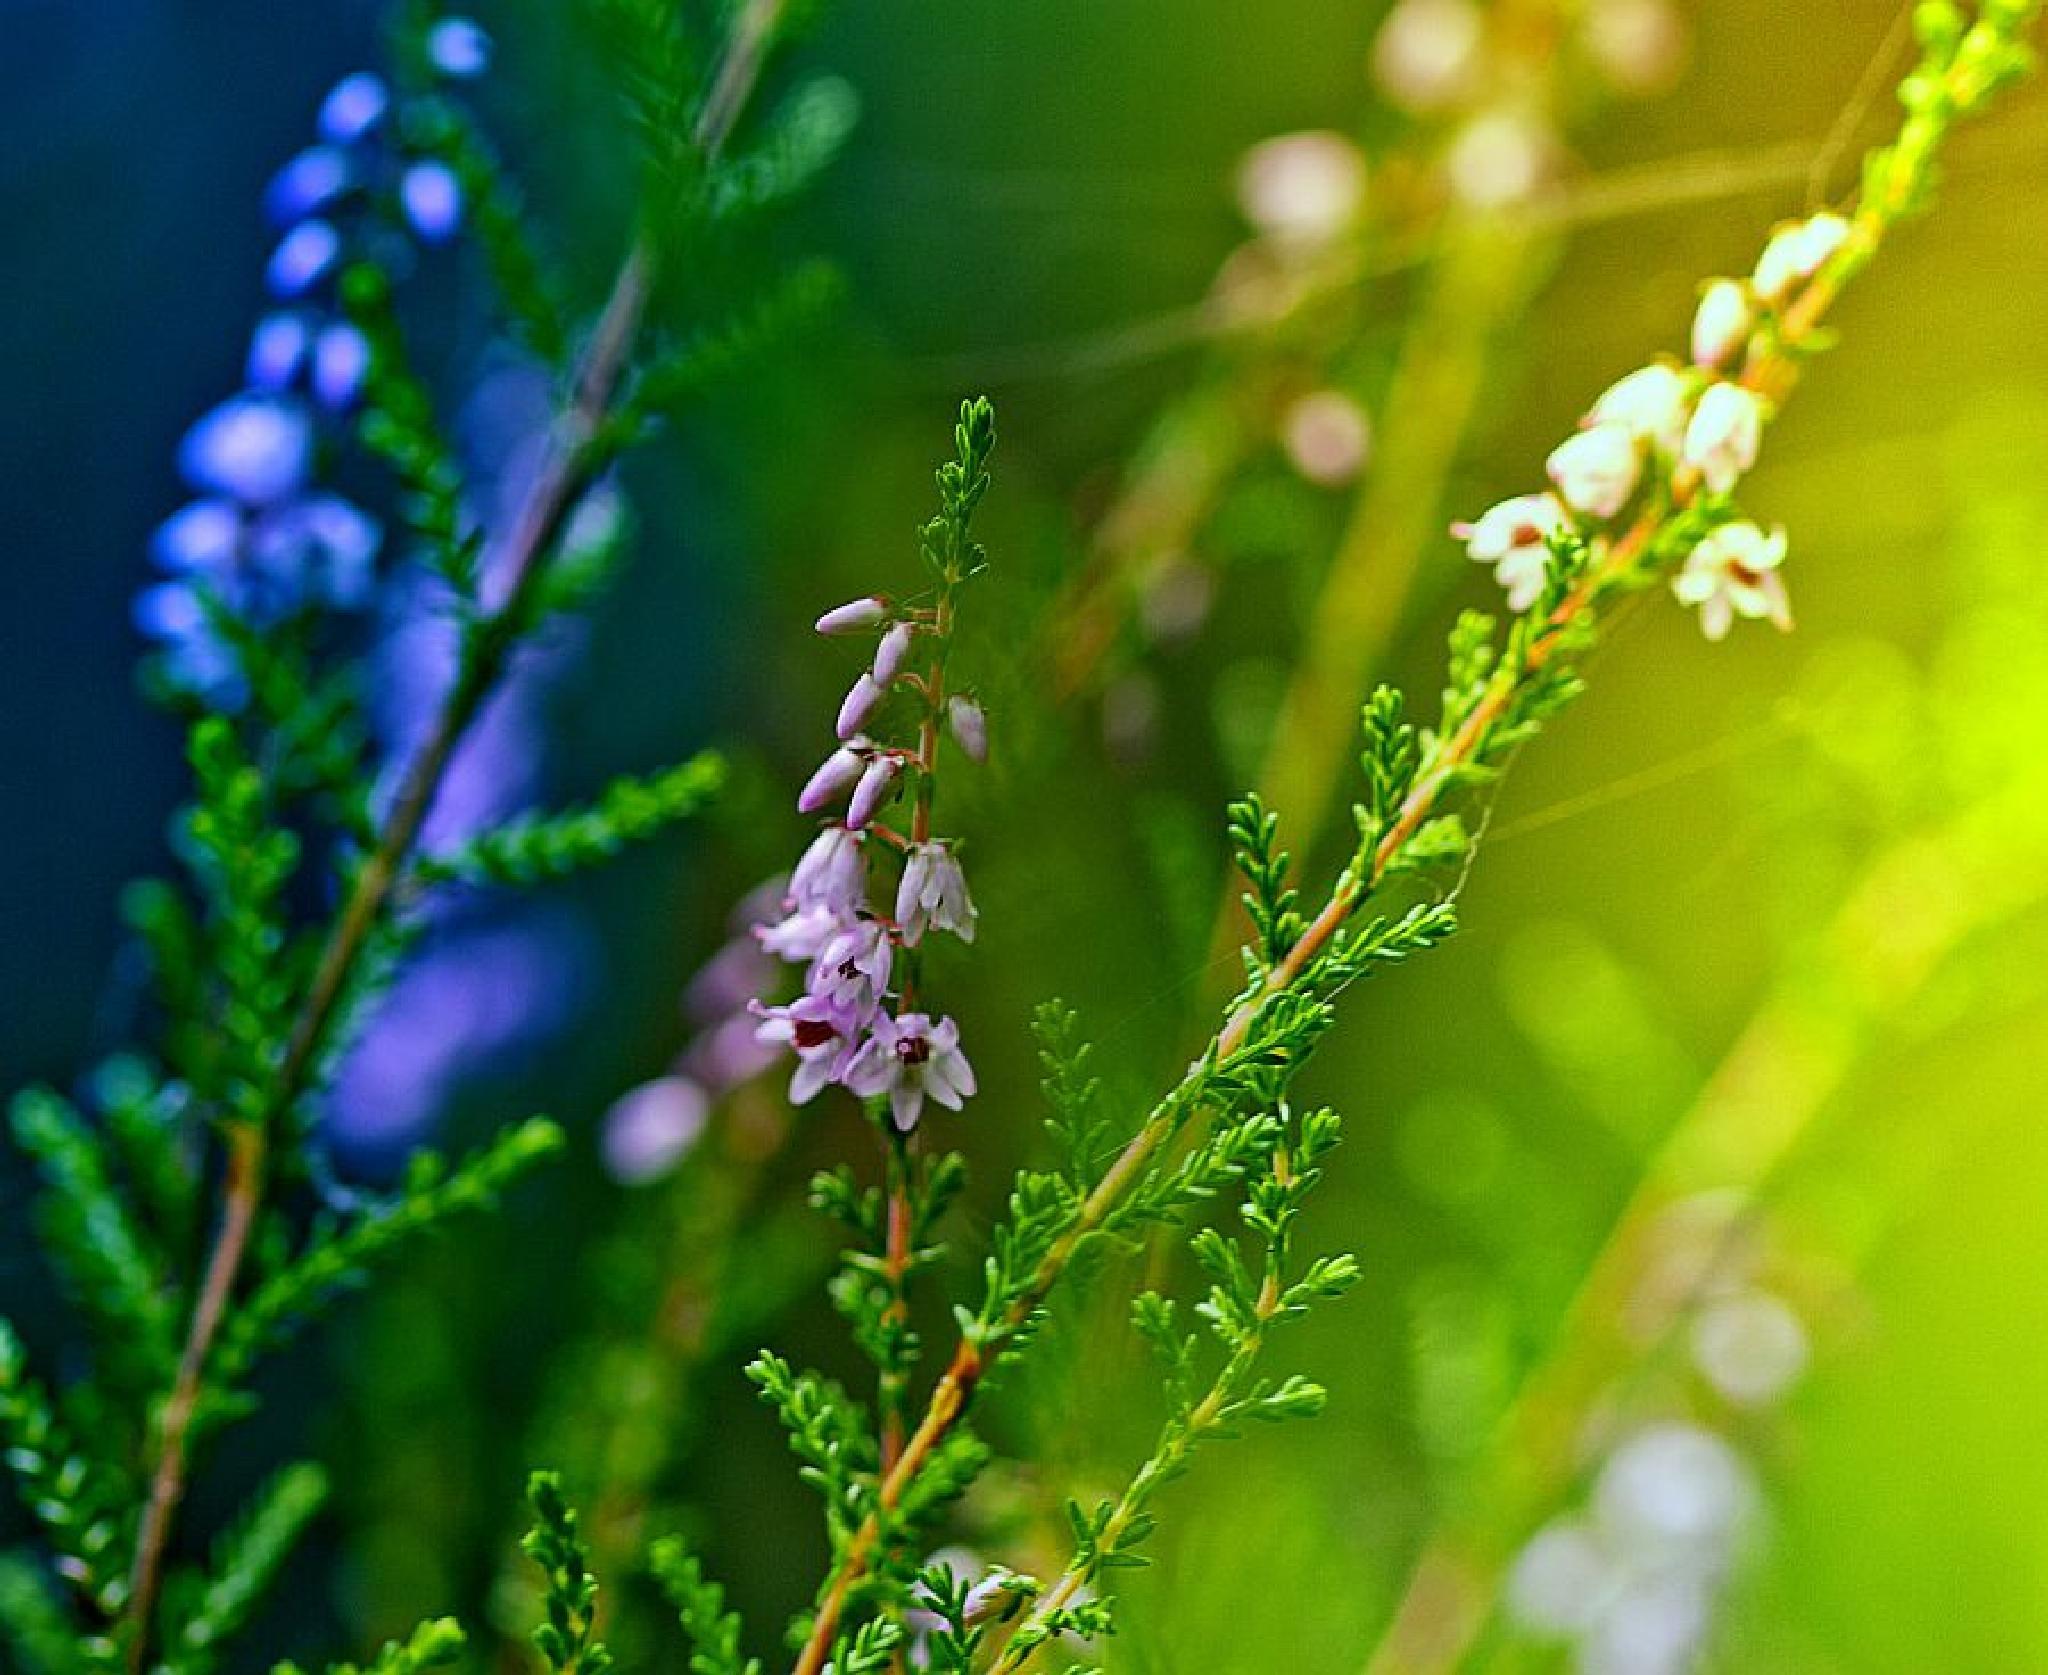 Summer moment by Almantas B